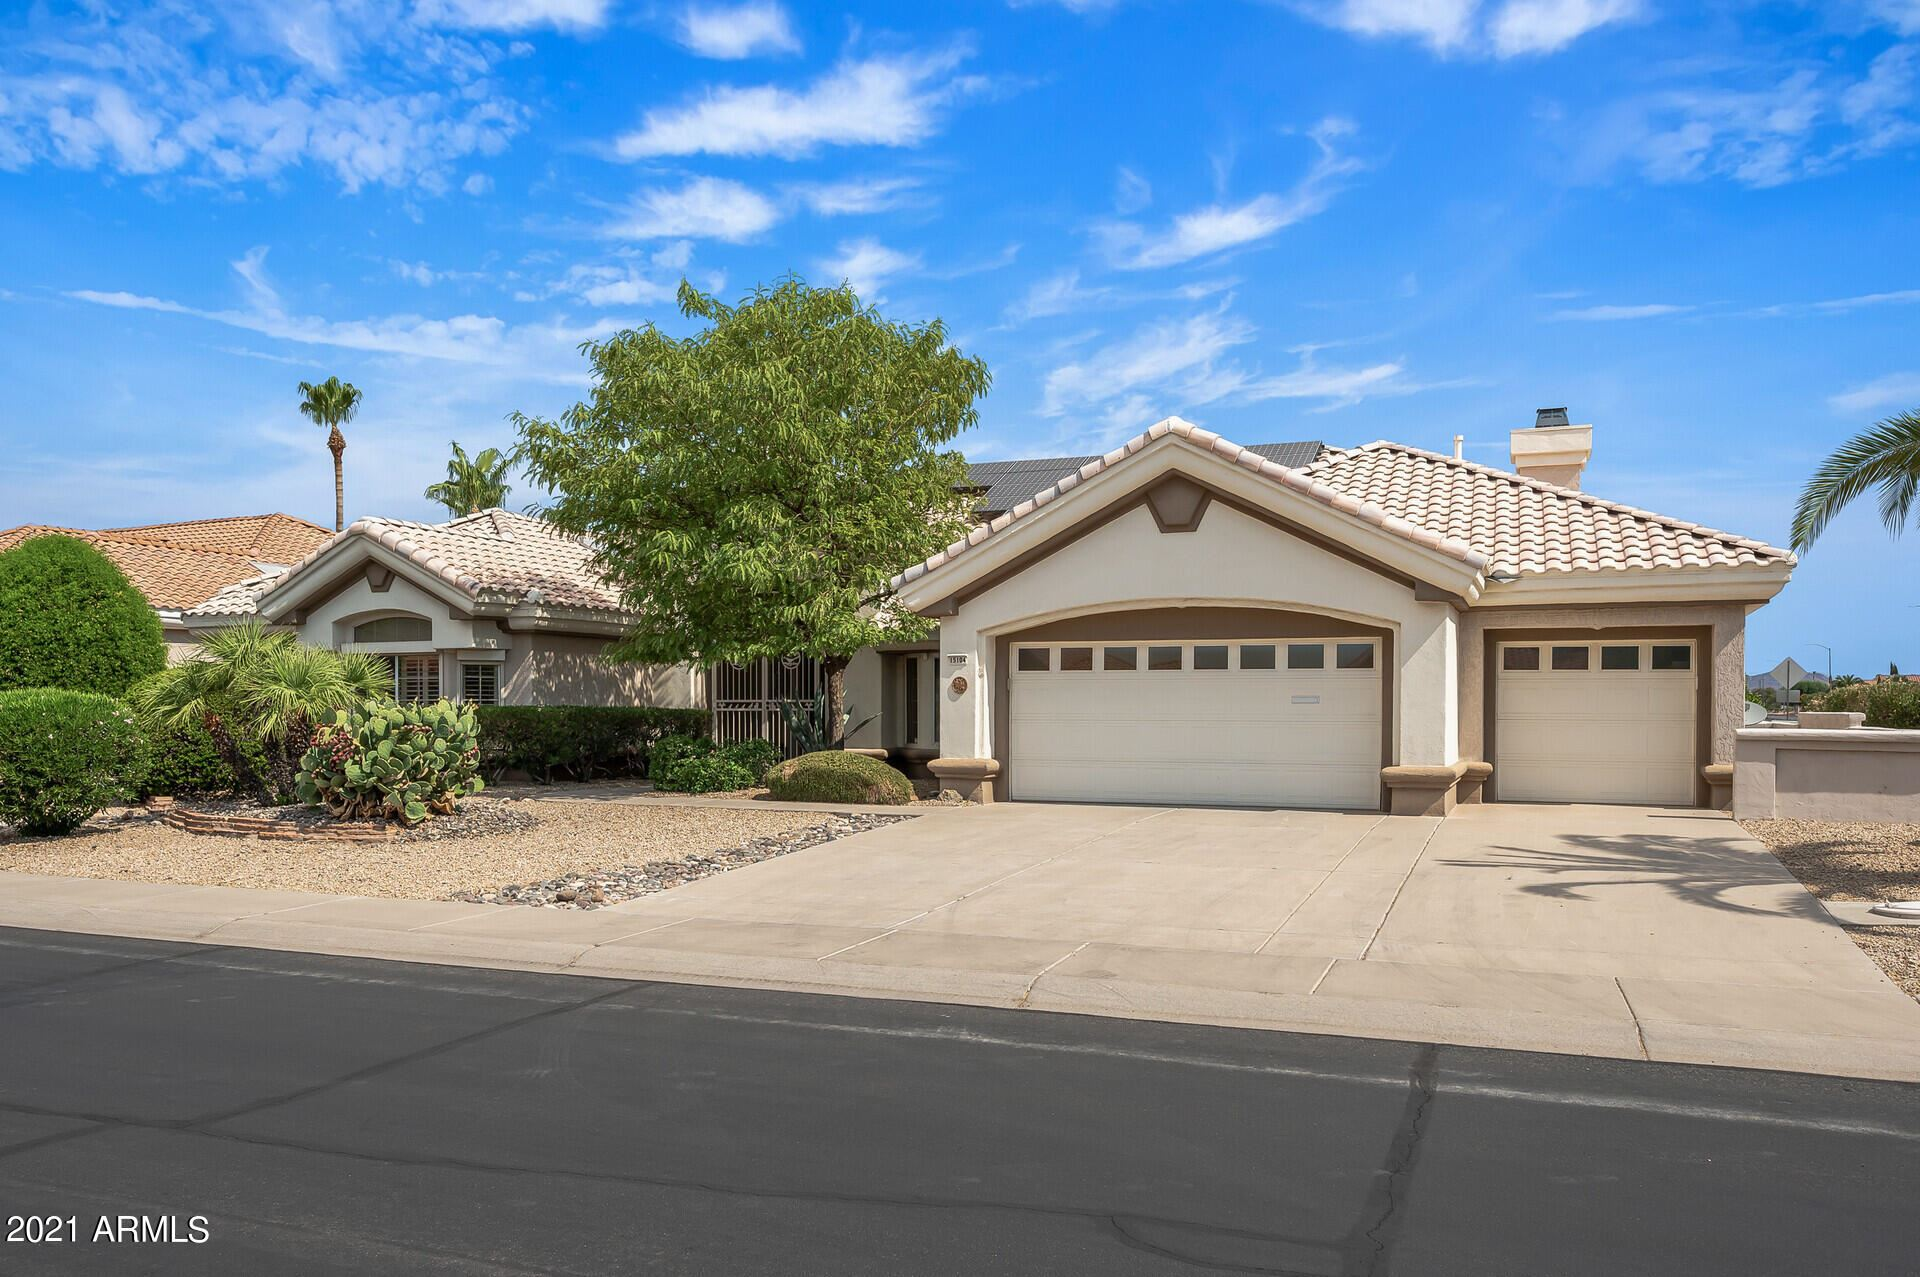 15104 W WHITEWOOD Drive, Sun City West, AZ 85375 - MLS#: 6245091